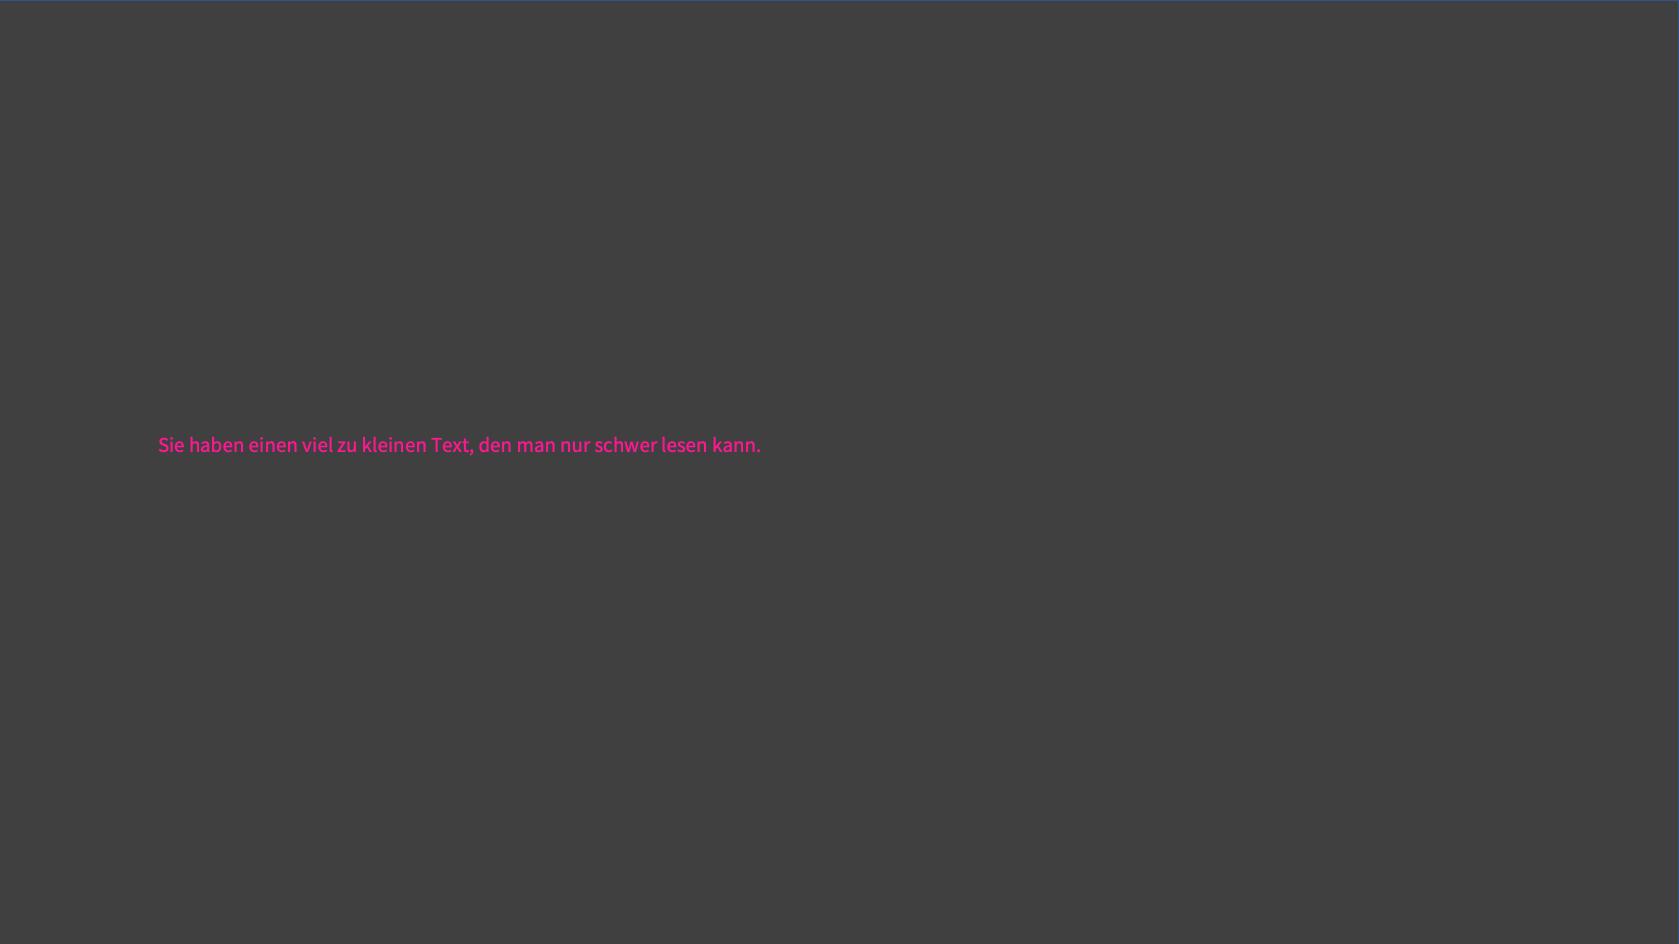 webdesign-fehler 4